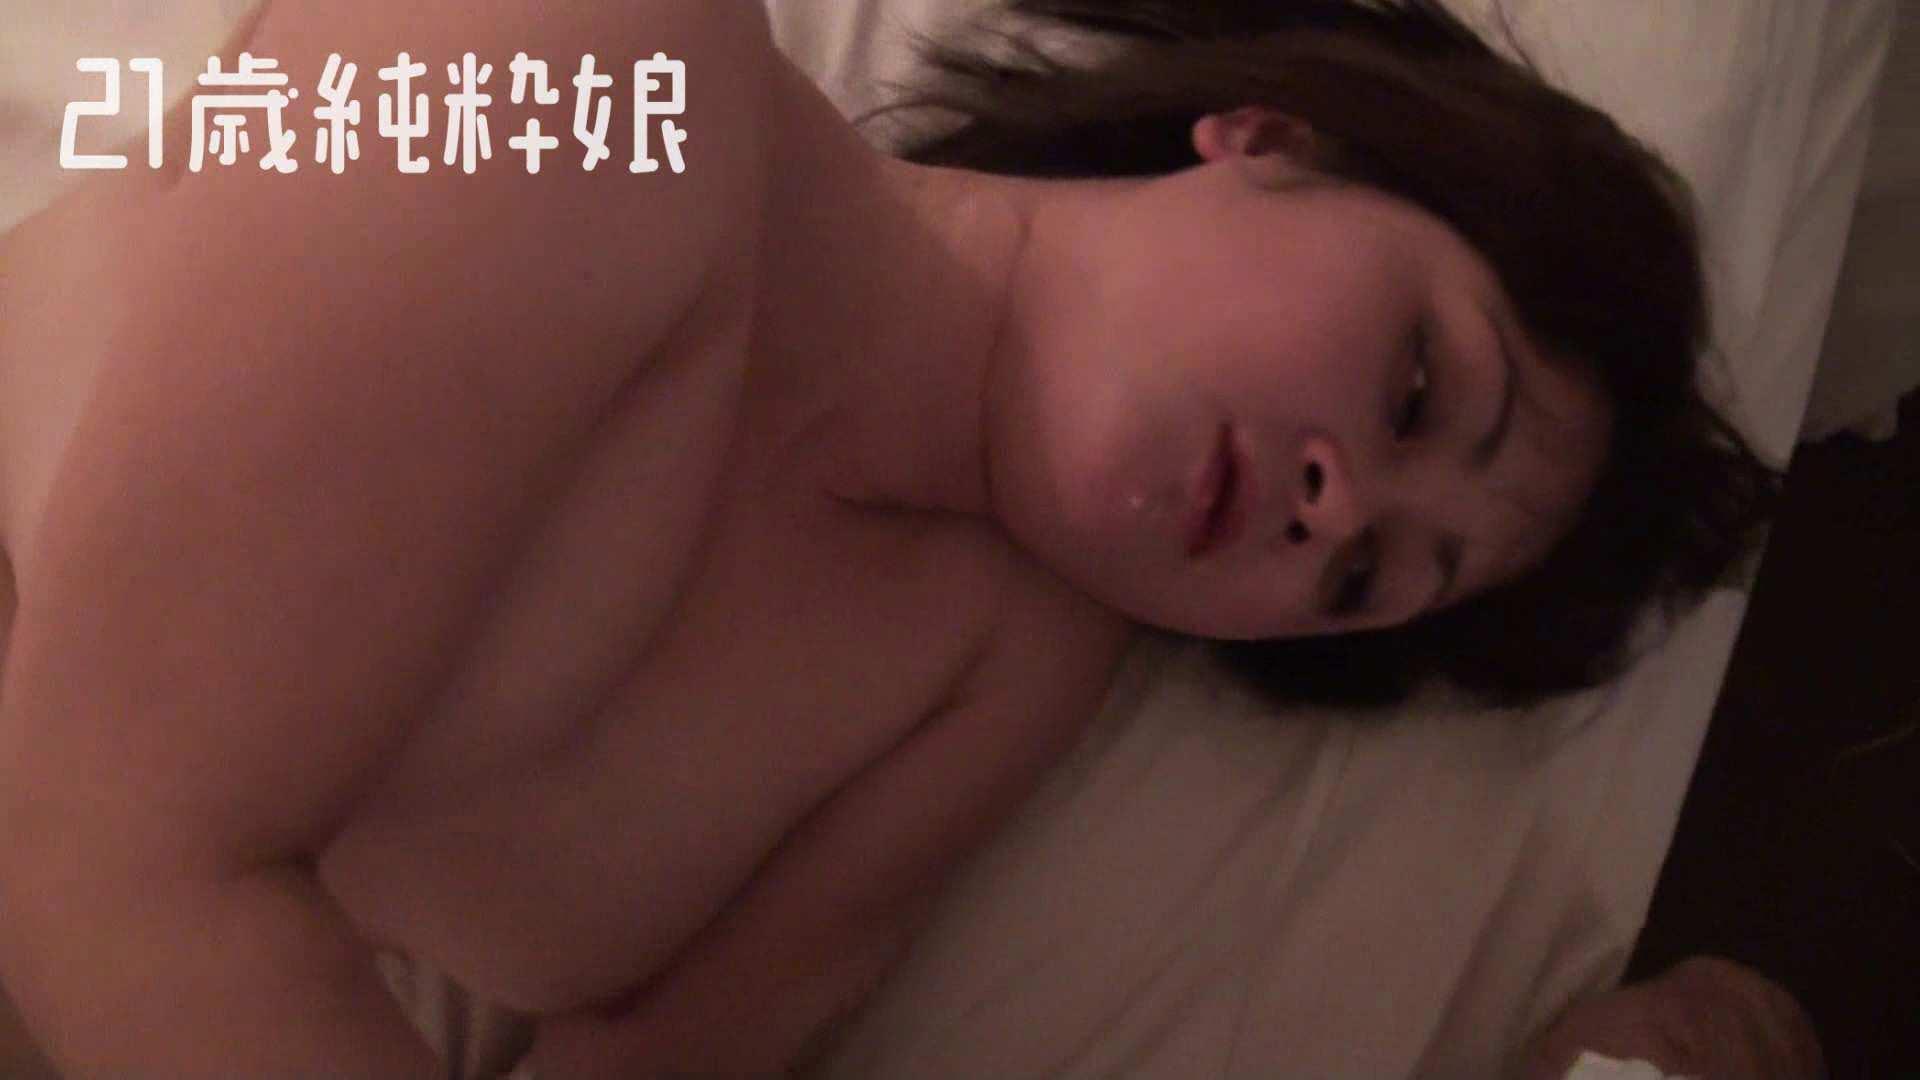 Gカップ21歳純粋嬢第2弾Vol.4 OLの裸事情 | 学校  69枚 64